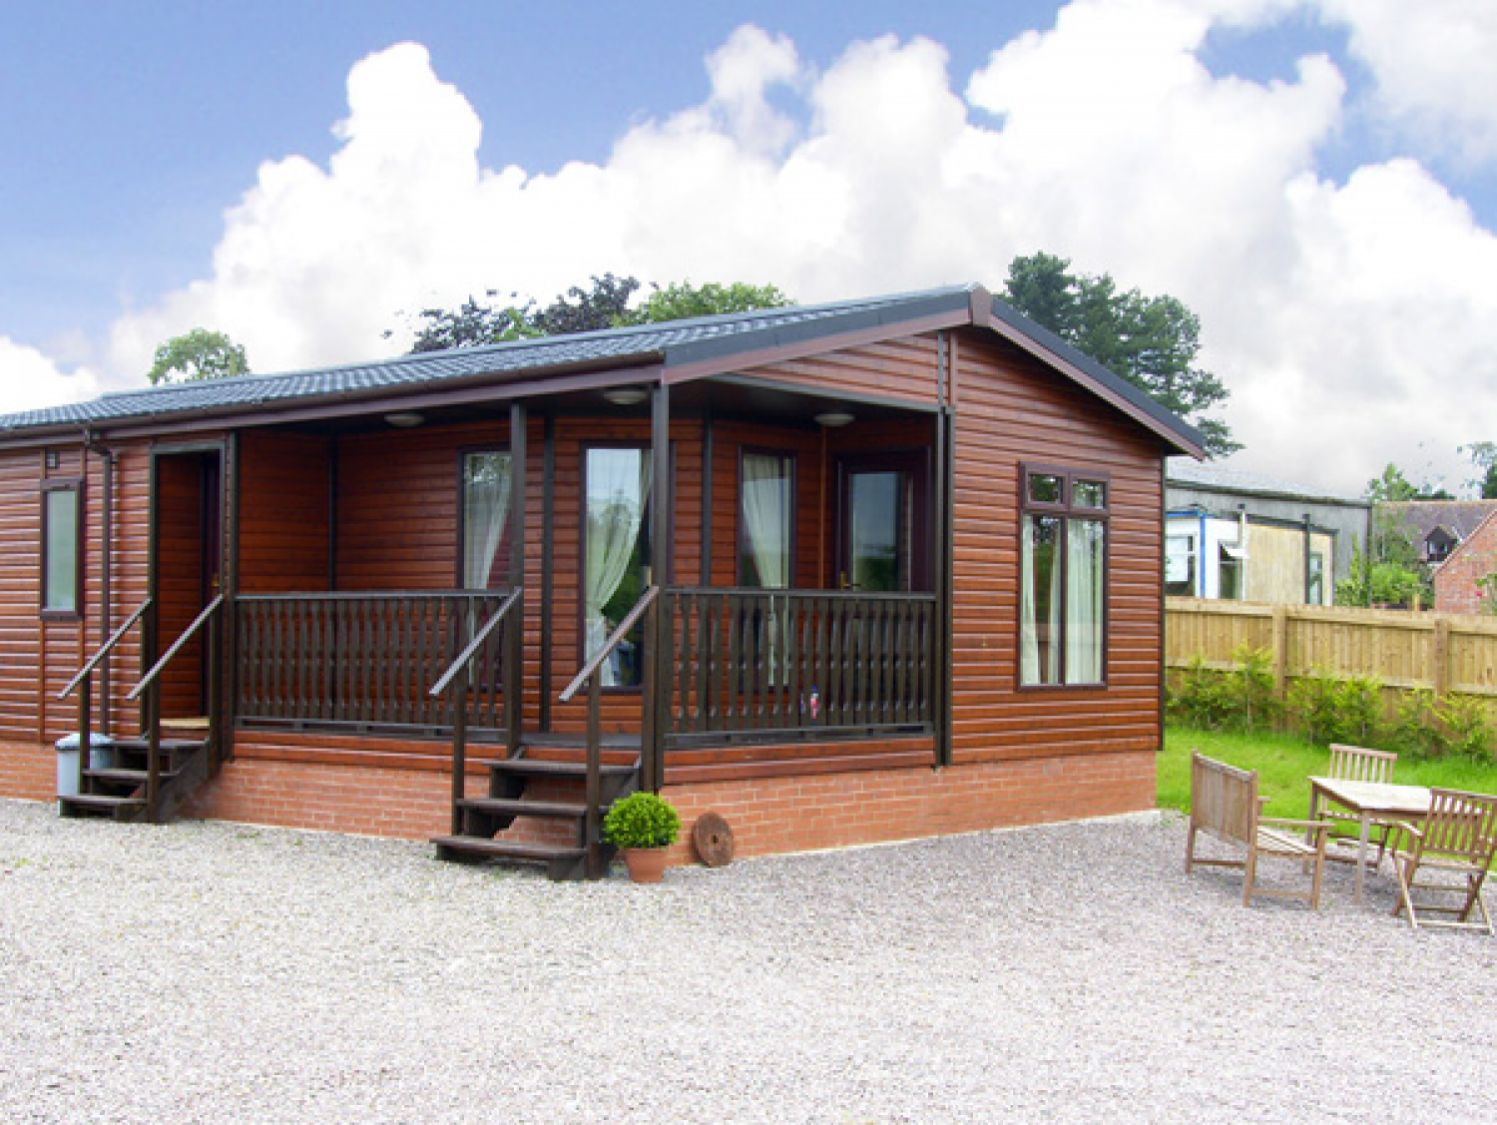 Rhubarb Lodge - Holiday Park in Bromyard, Herefordshire, England